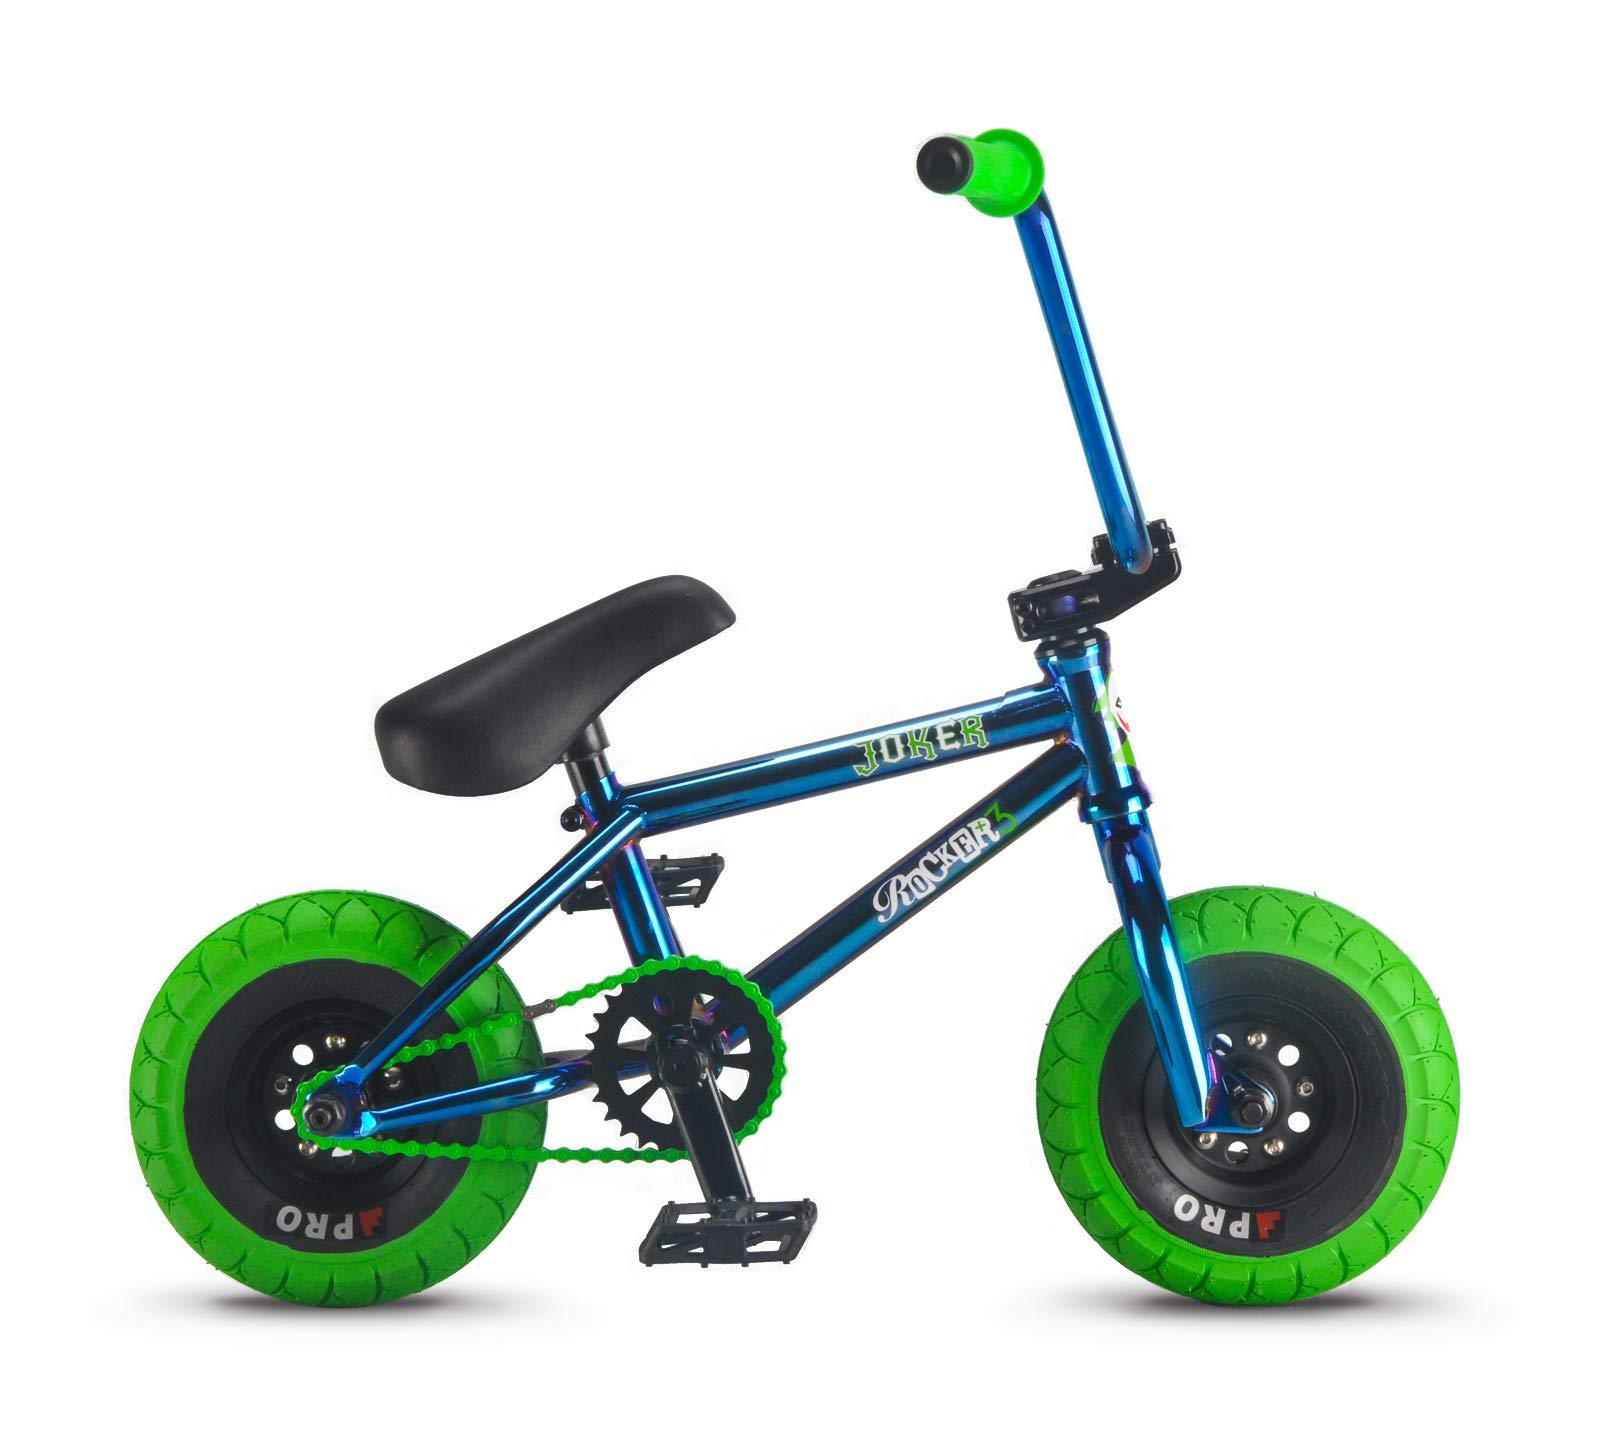 Bicicleta mini-BMX de Rocker BMX, modelo Joker 3+: Amazon.es ...